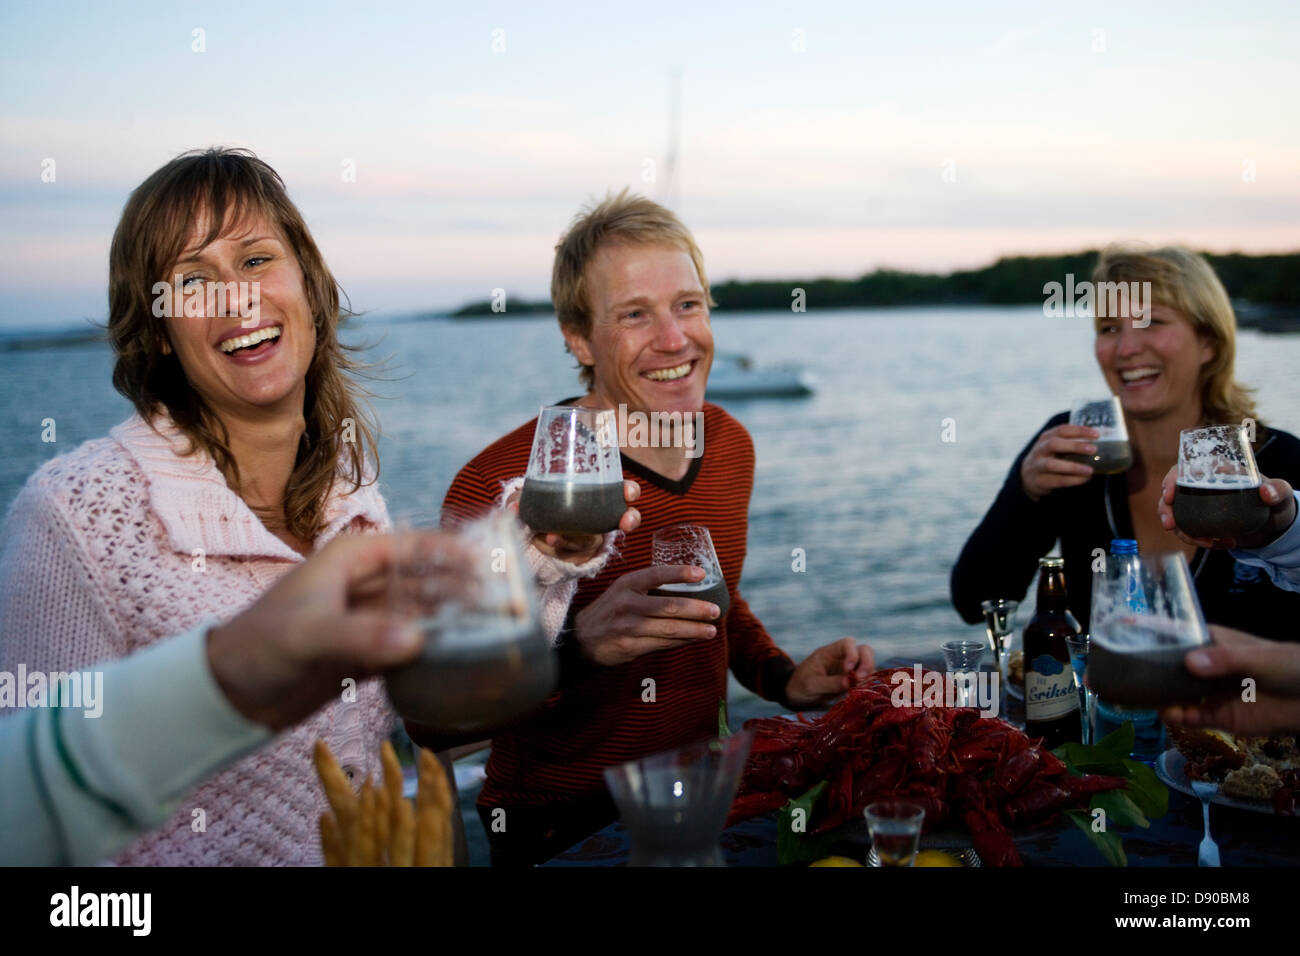 Parte de langostinos, Fejan, archipiélago de Estocolmo. Foto de stock